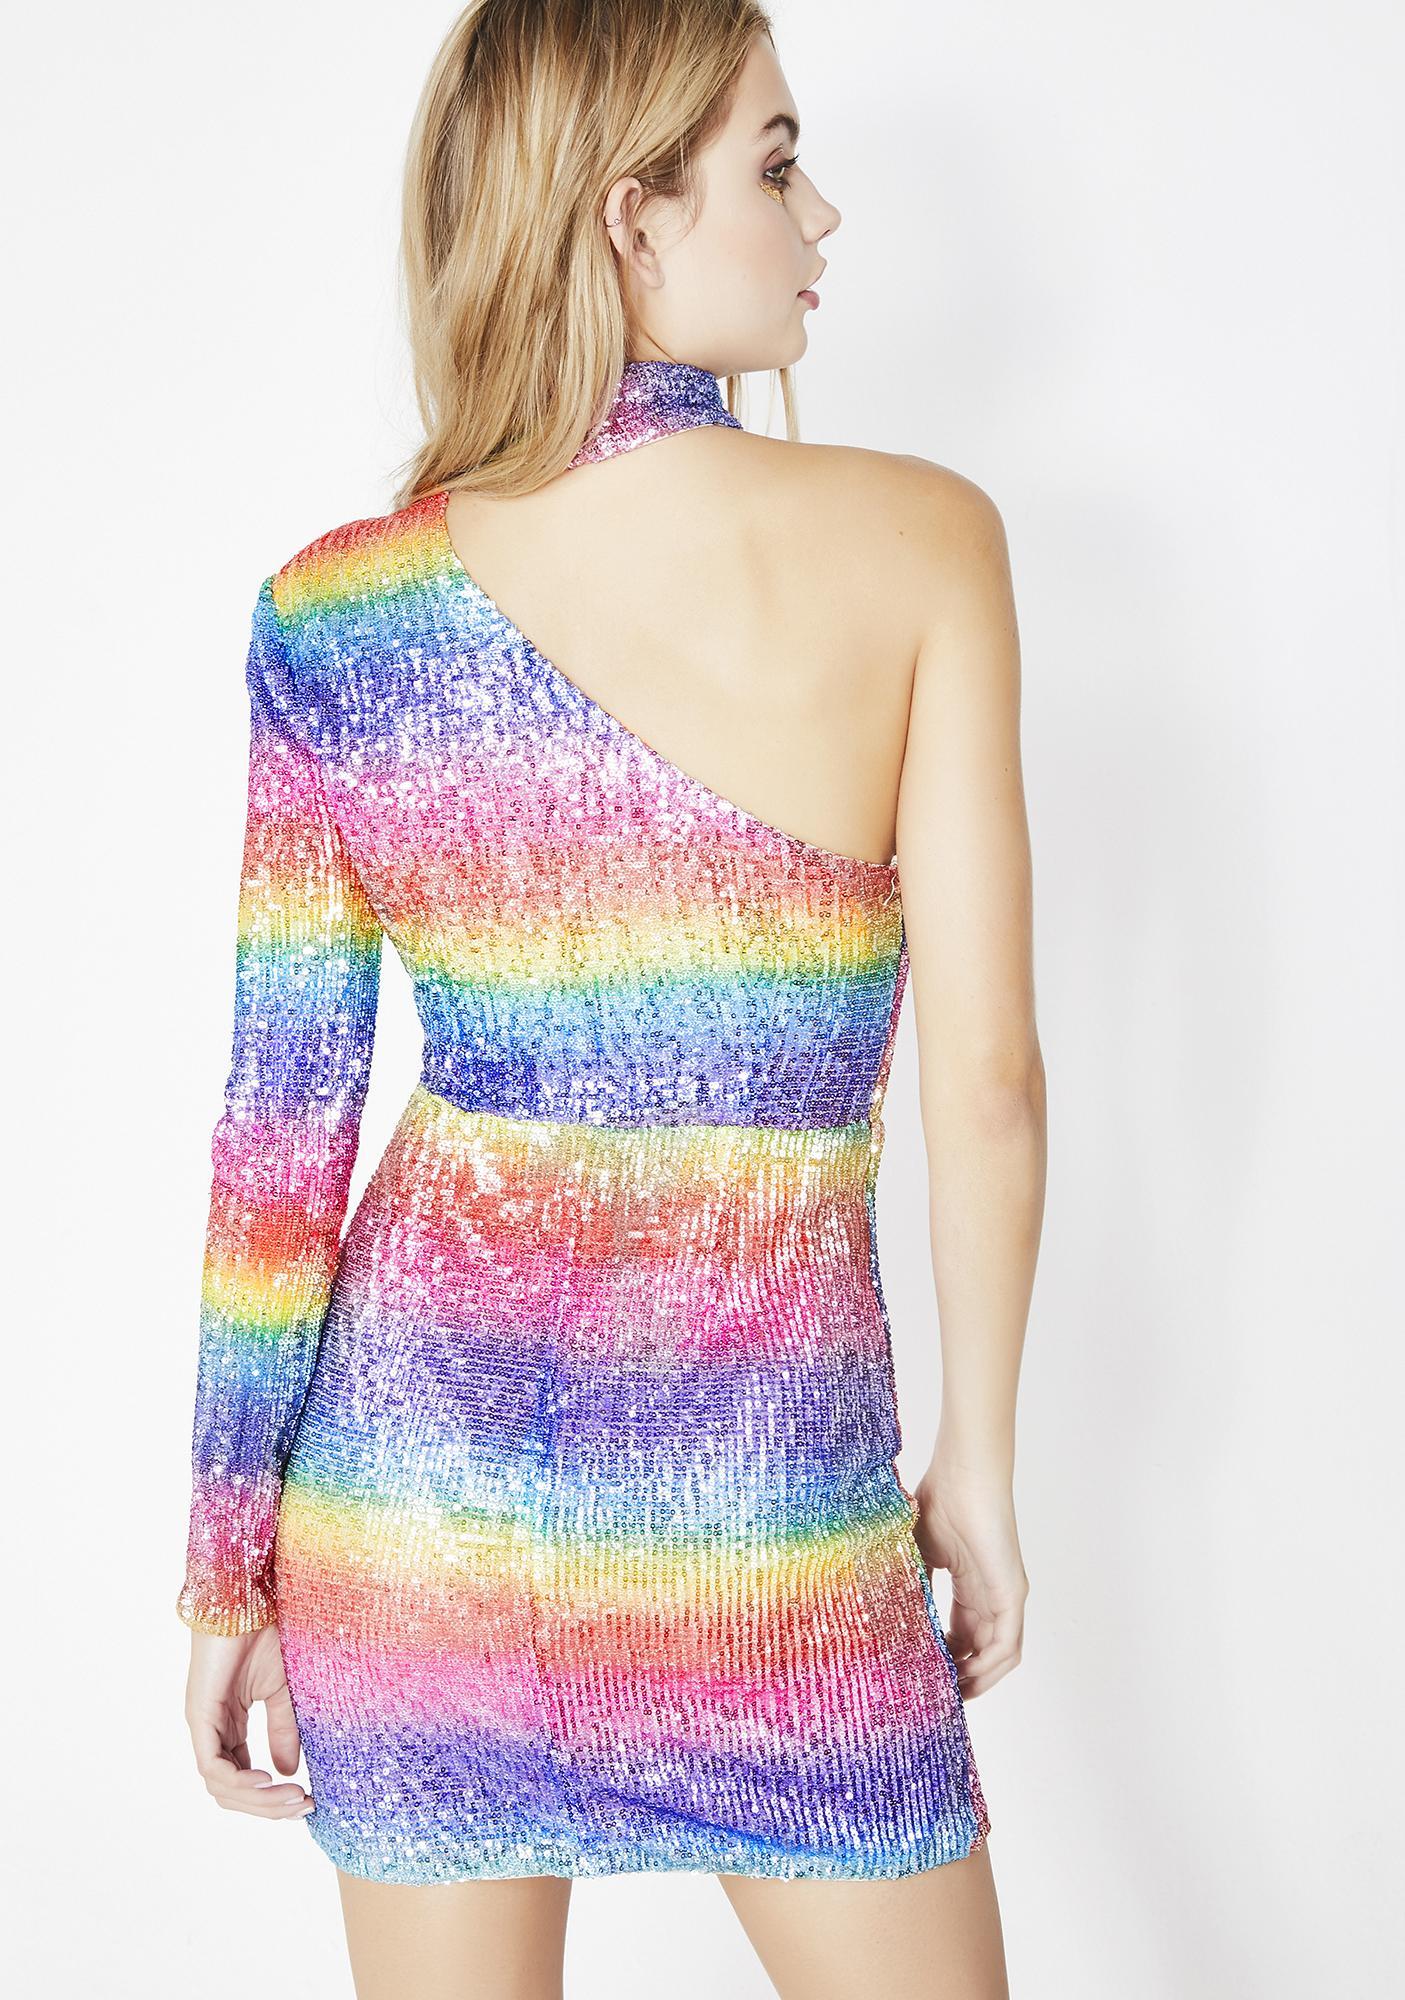 Rainbow Dream Girl Sequin Dress